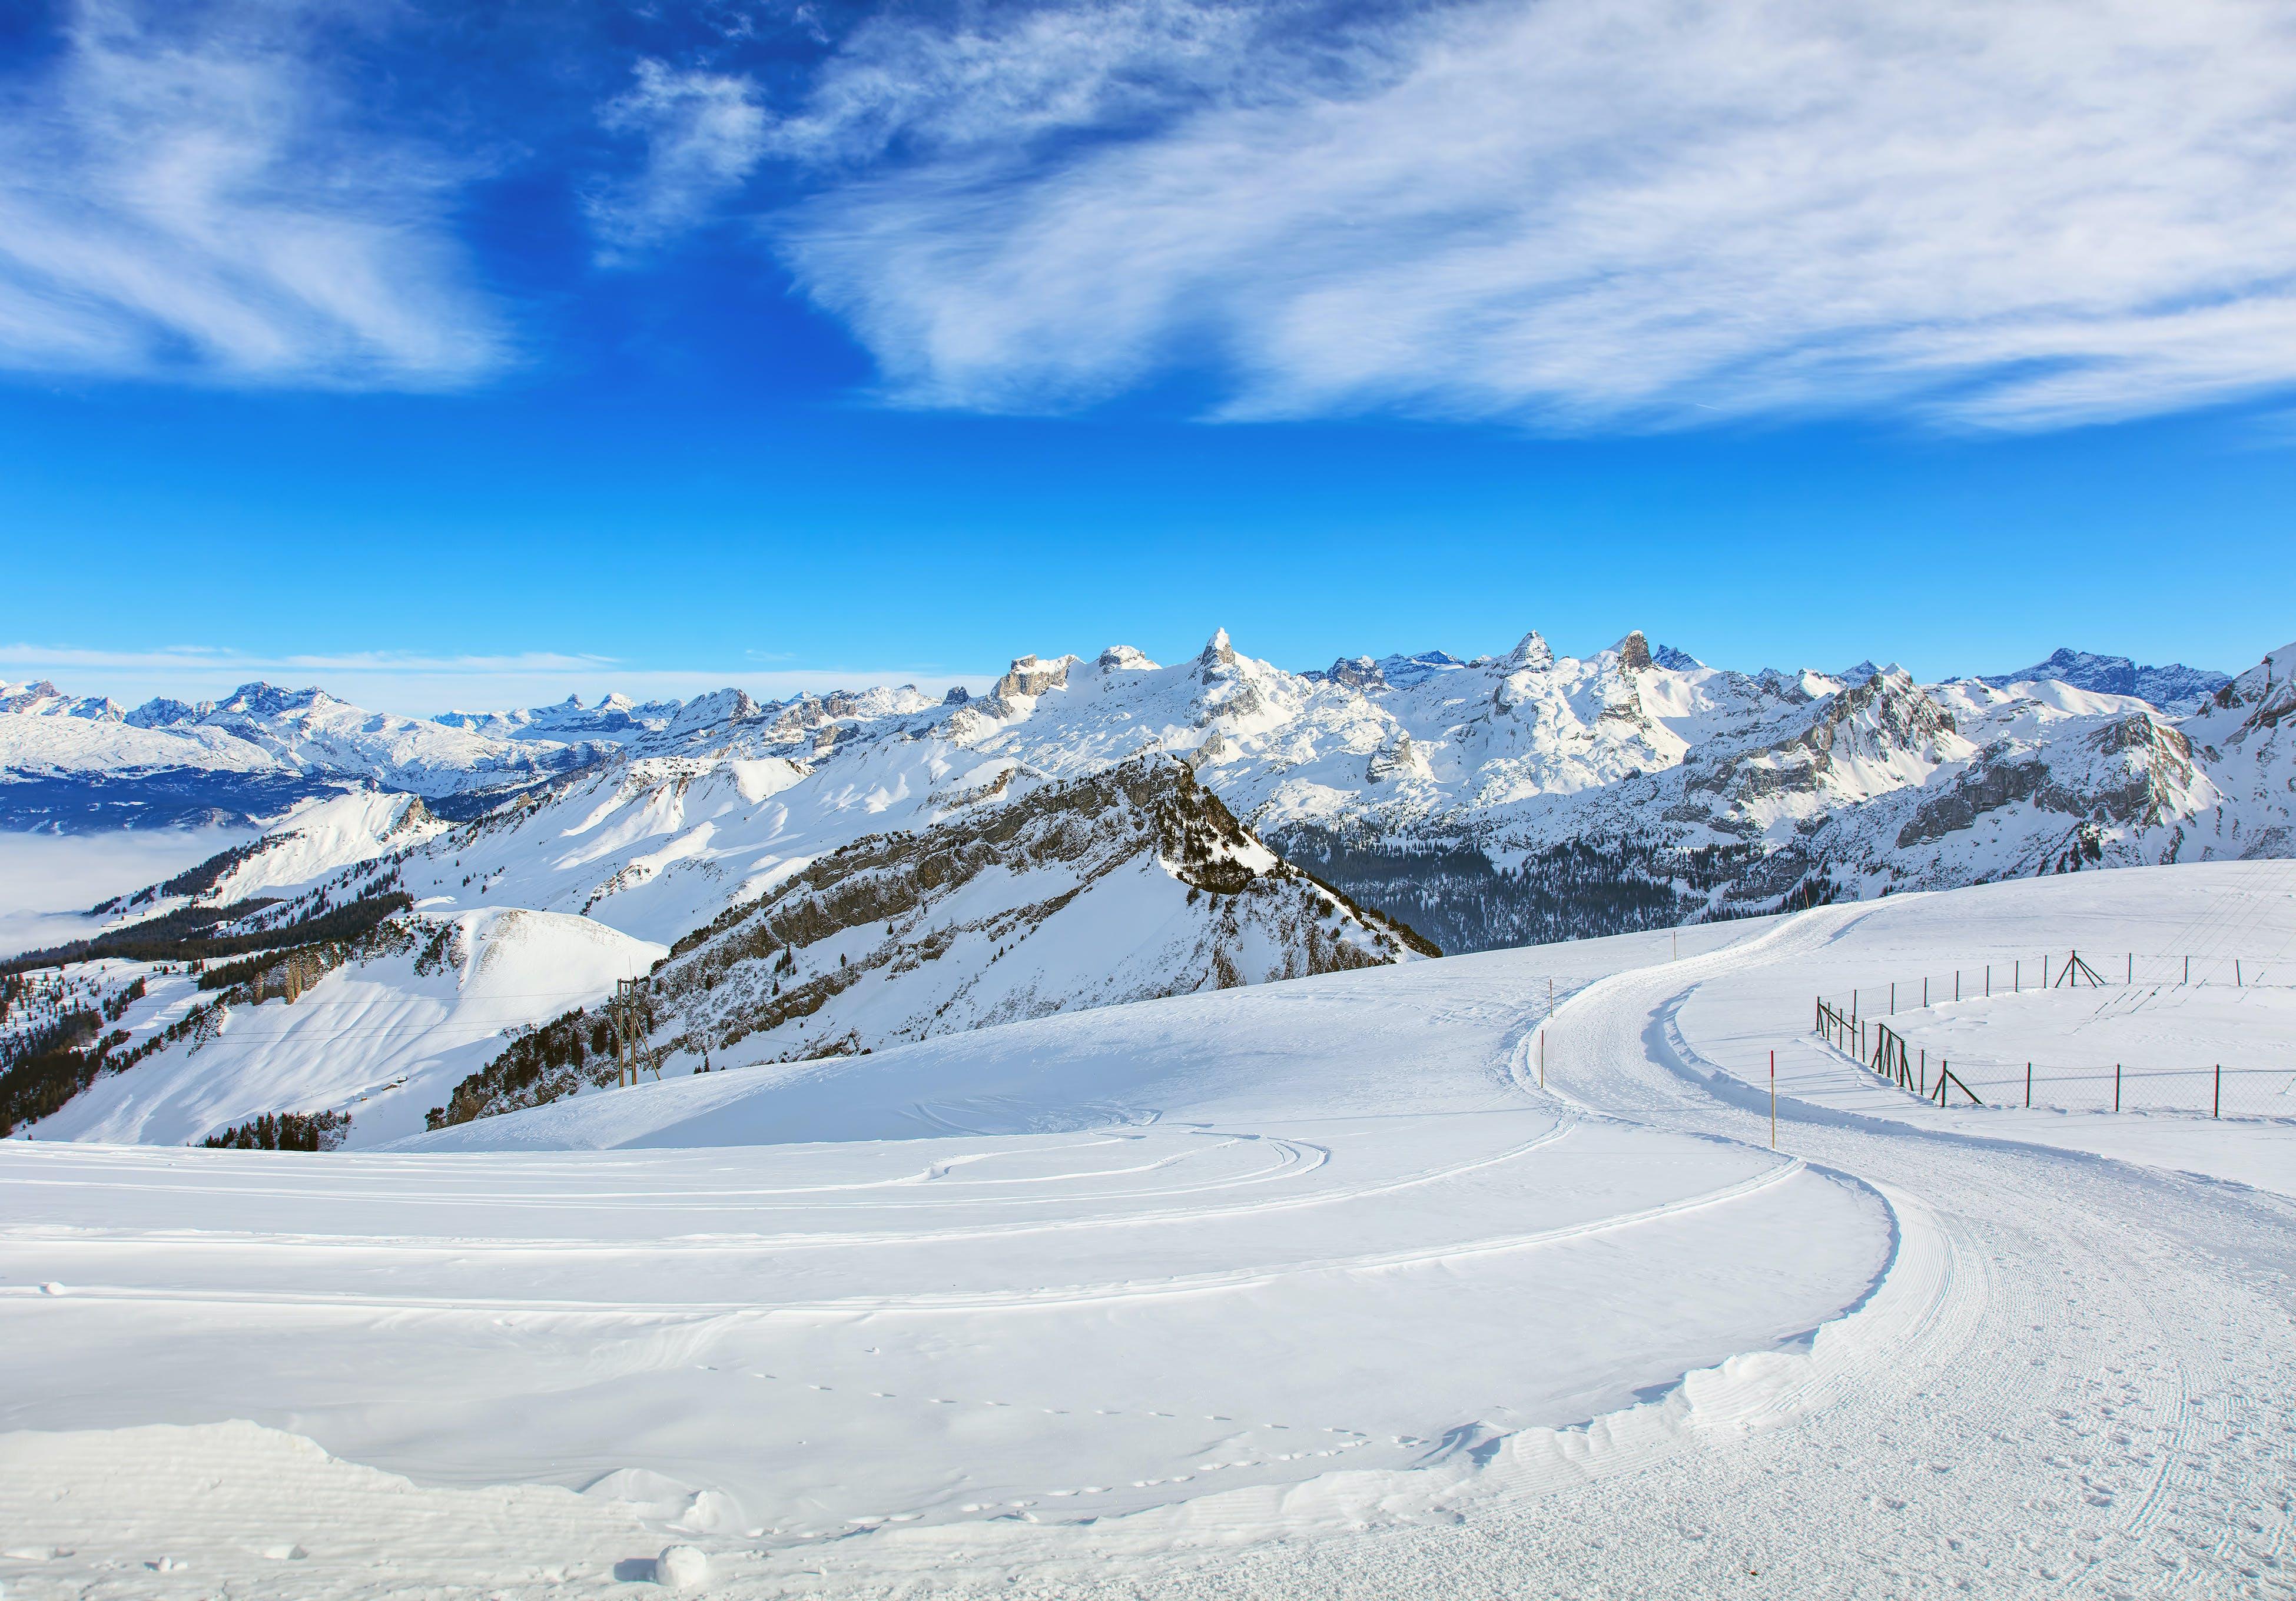 Photo of Mountains With White Snow